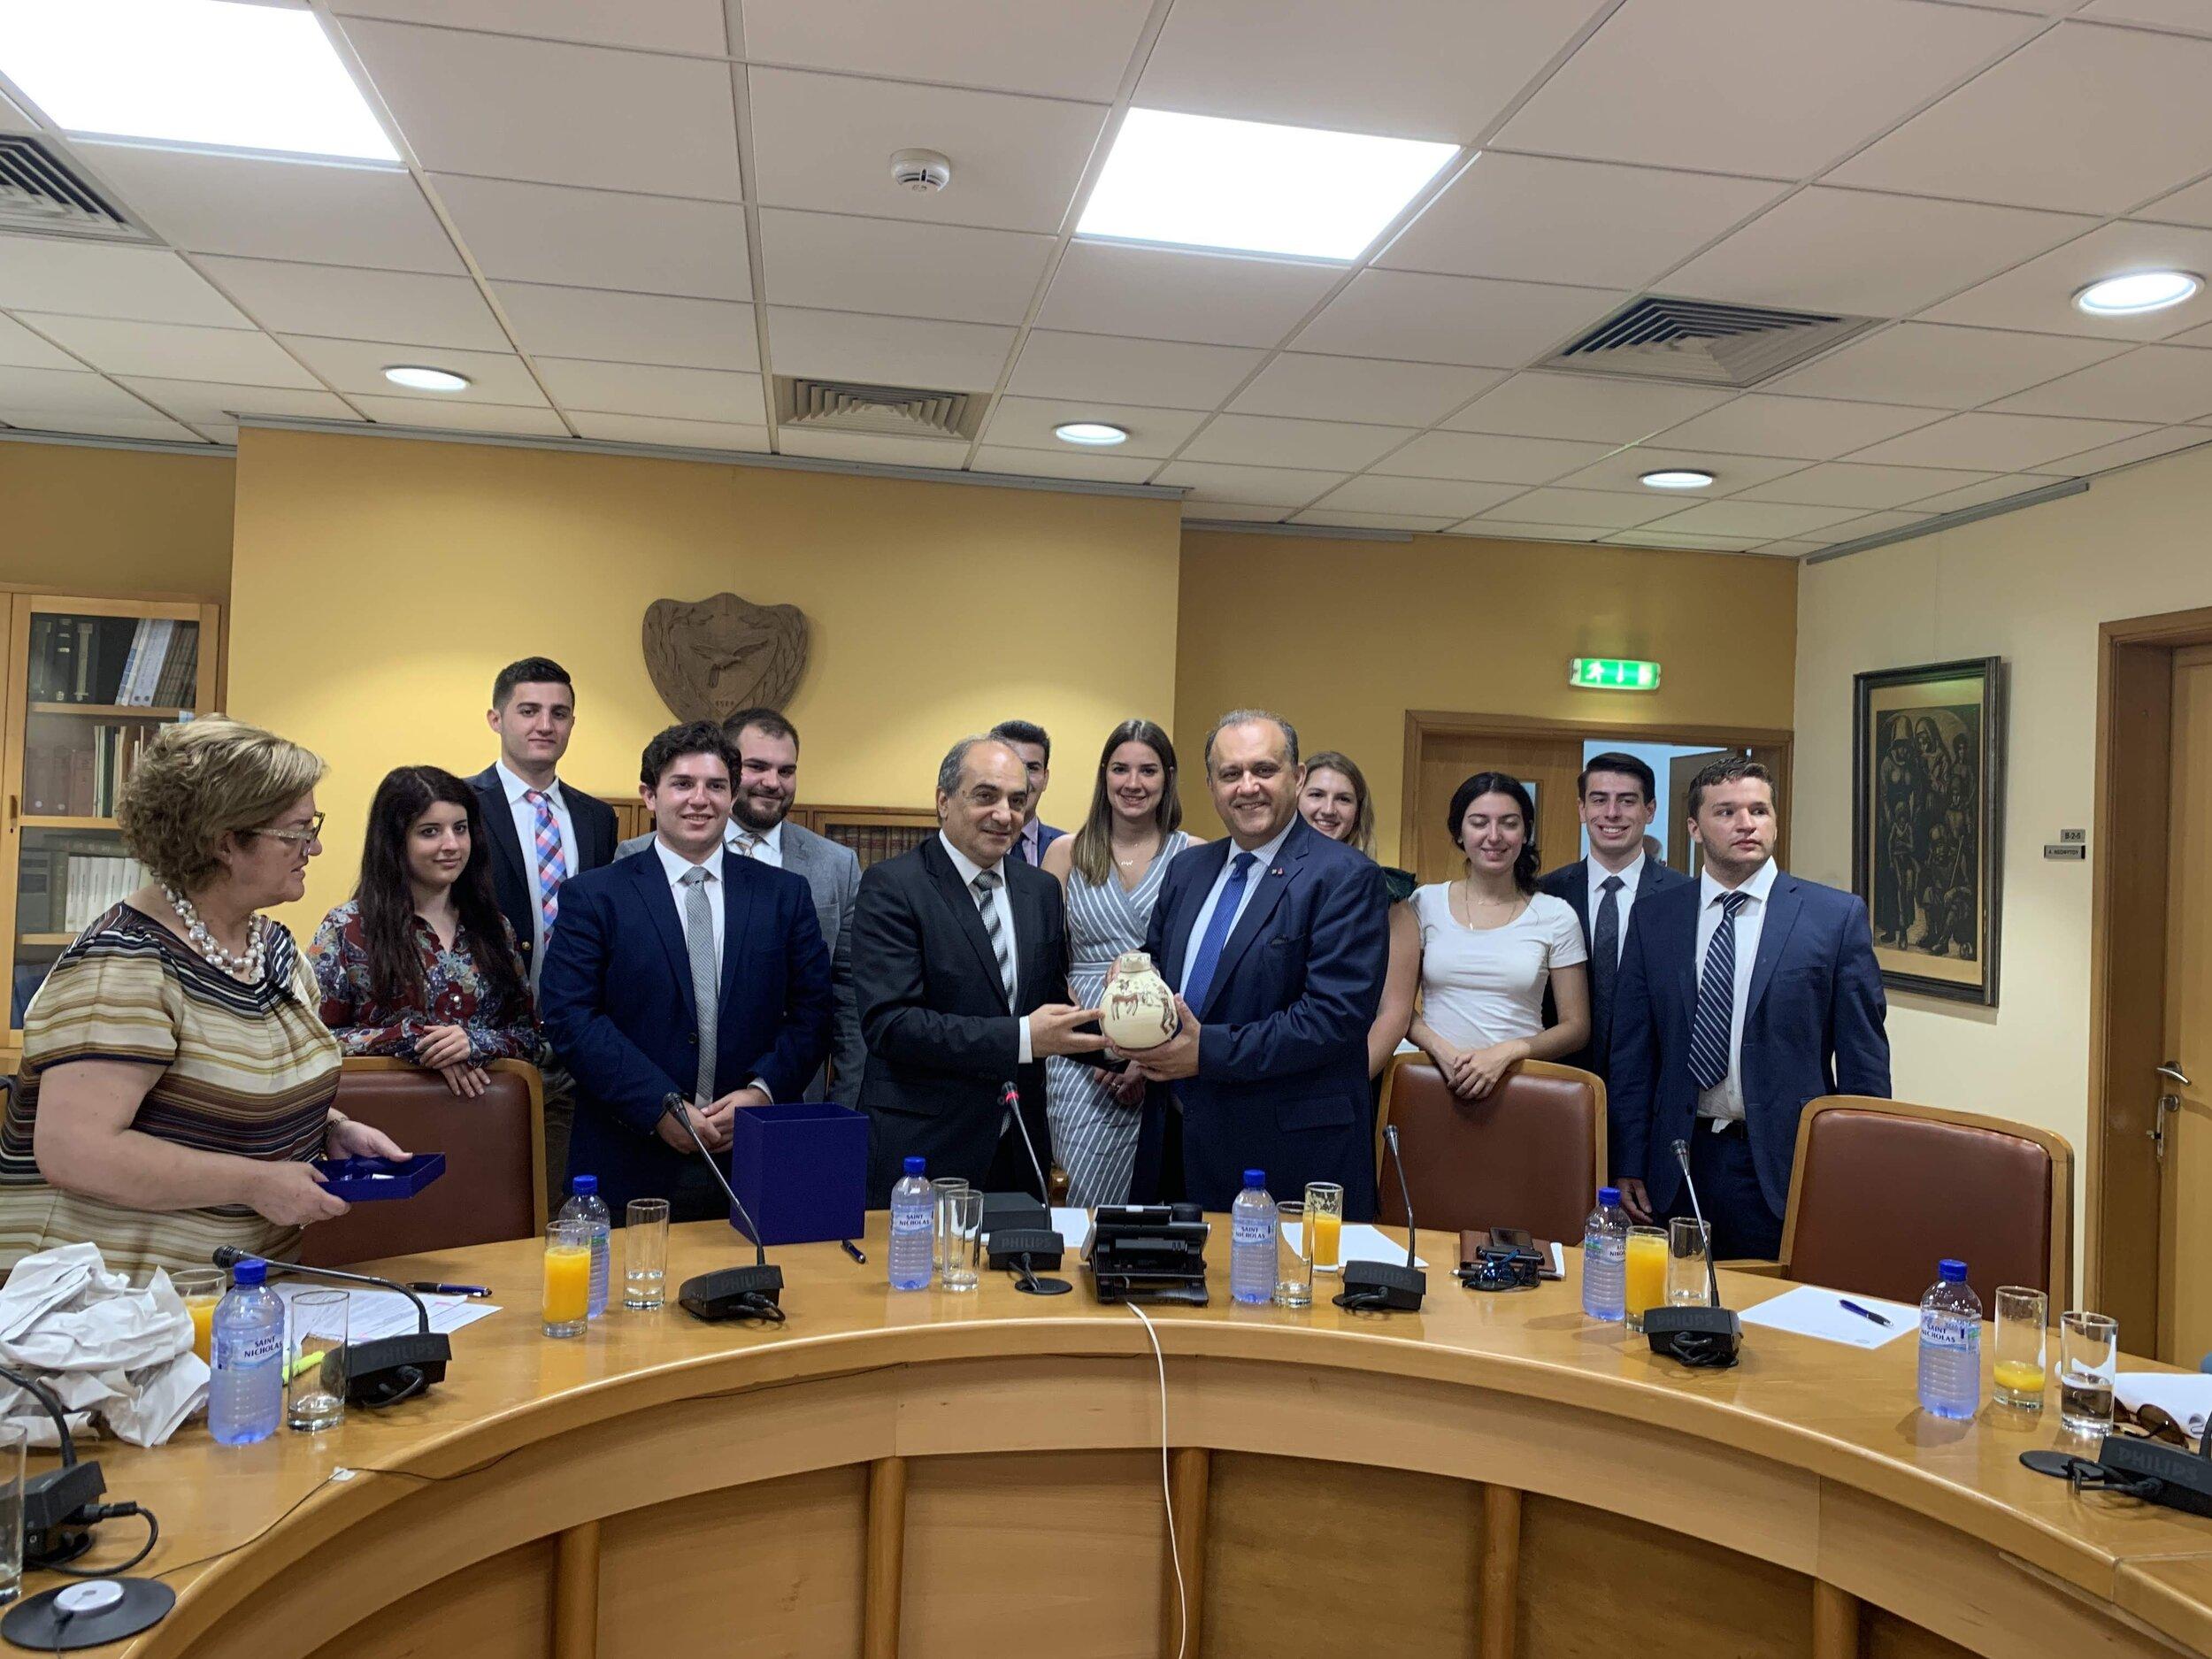 President of the House of Representatives Demetris Syllouris presents AHI President Larigakis with a commemorative momento